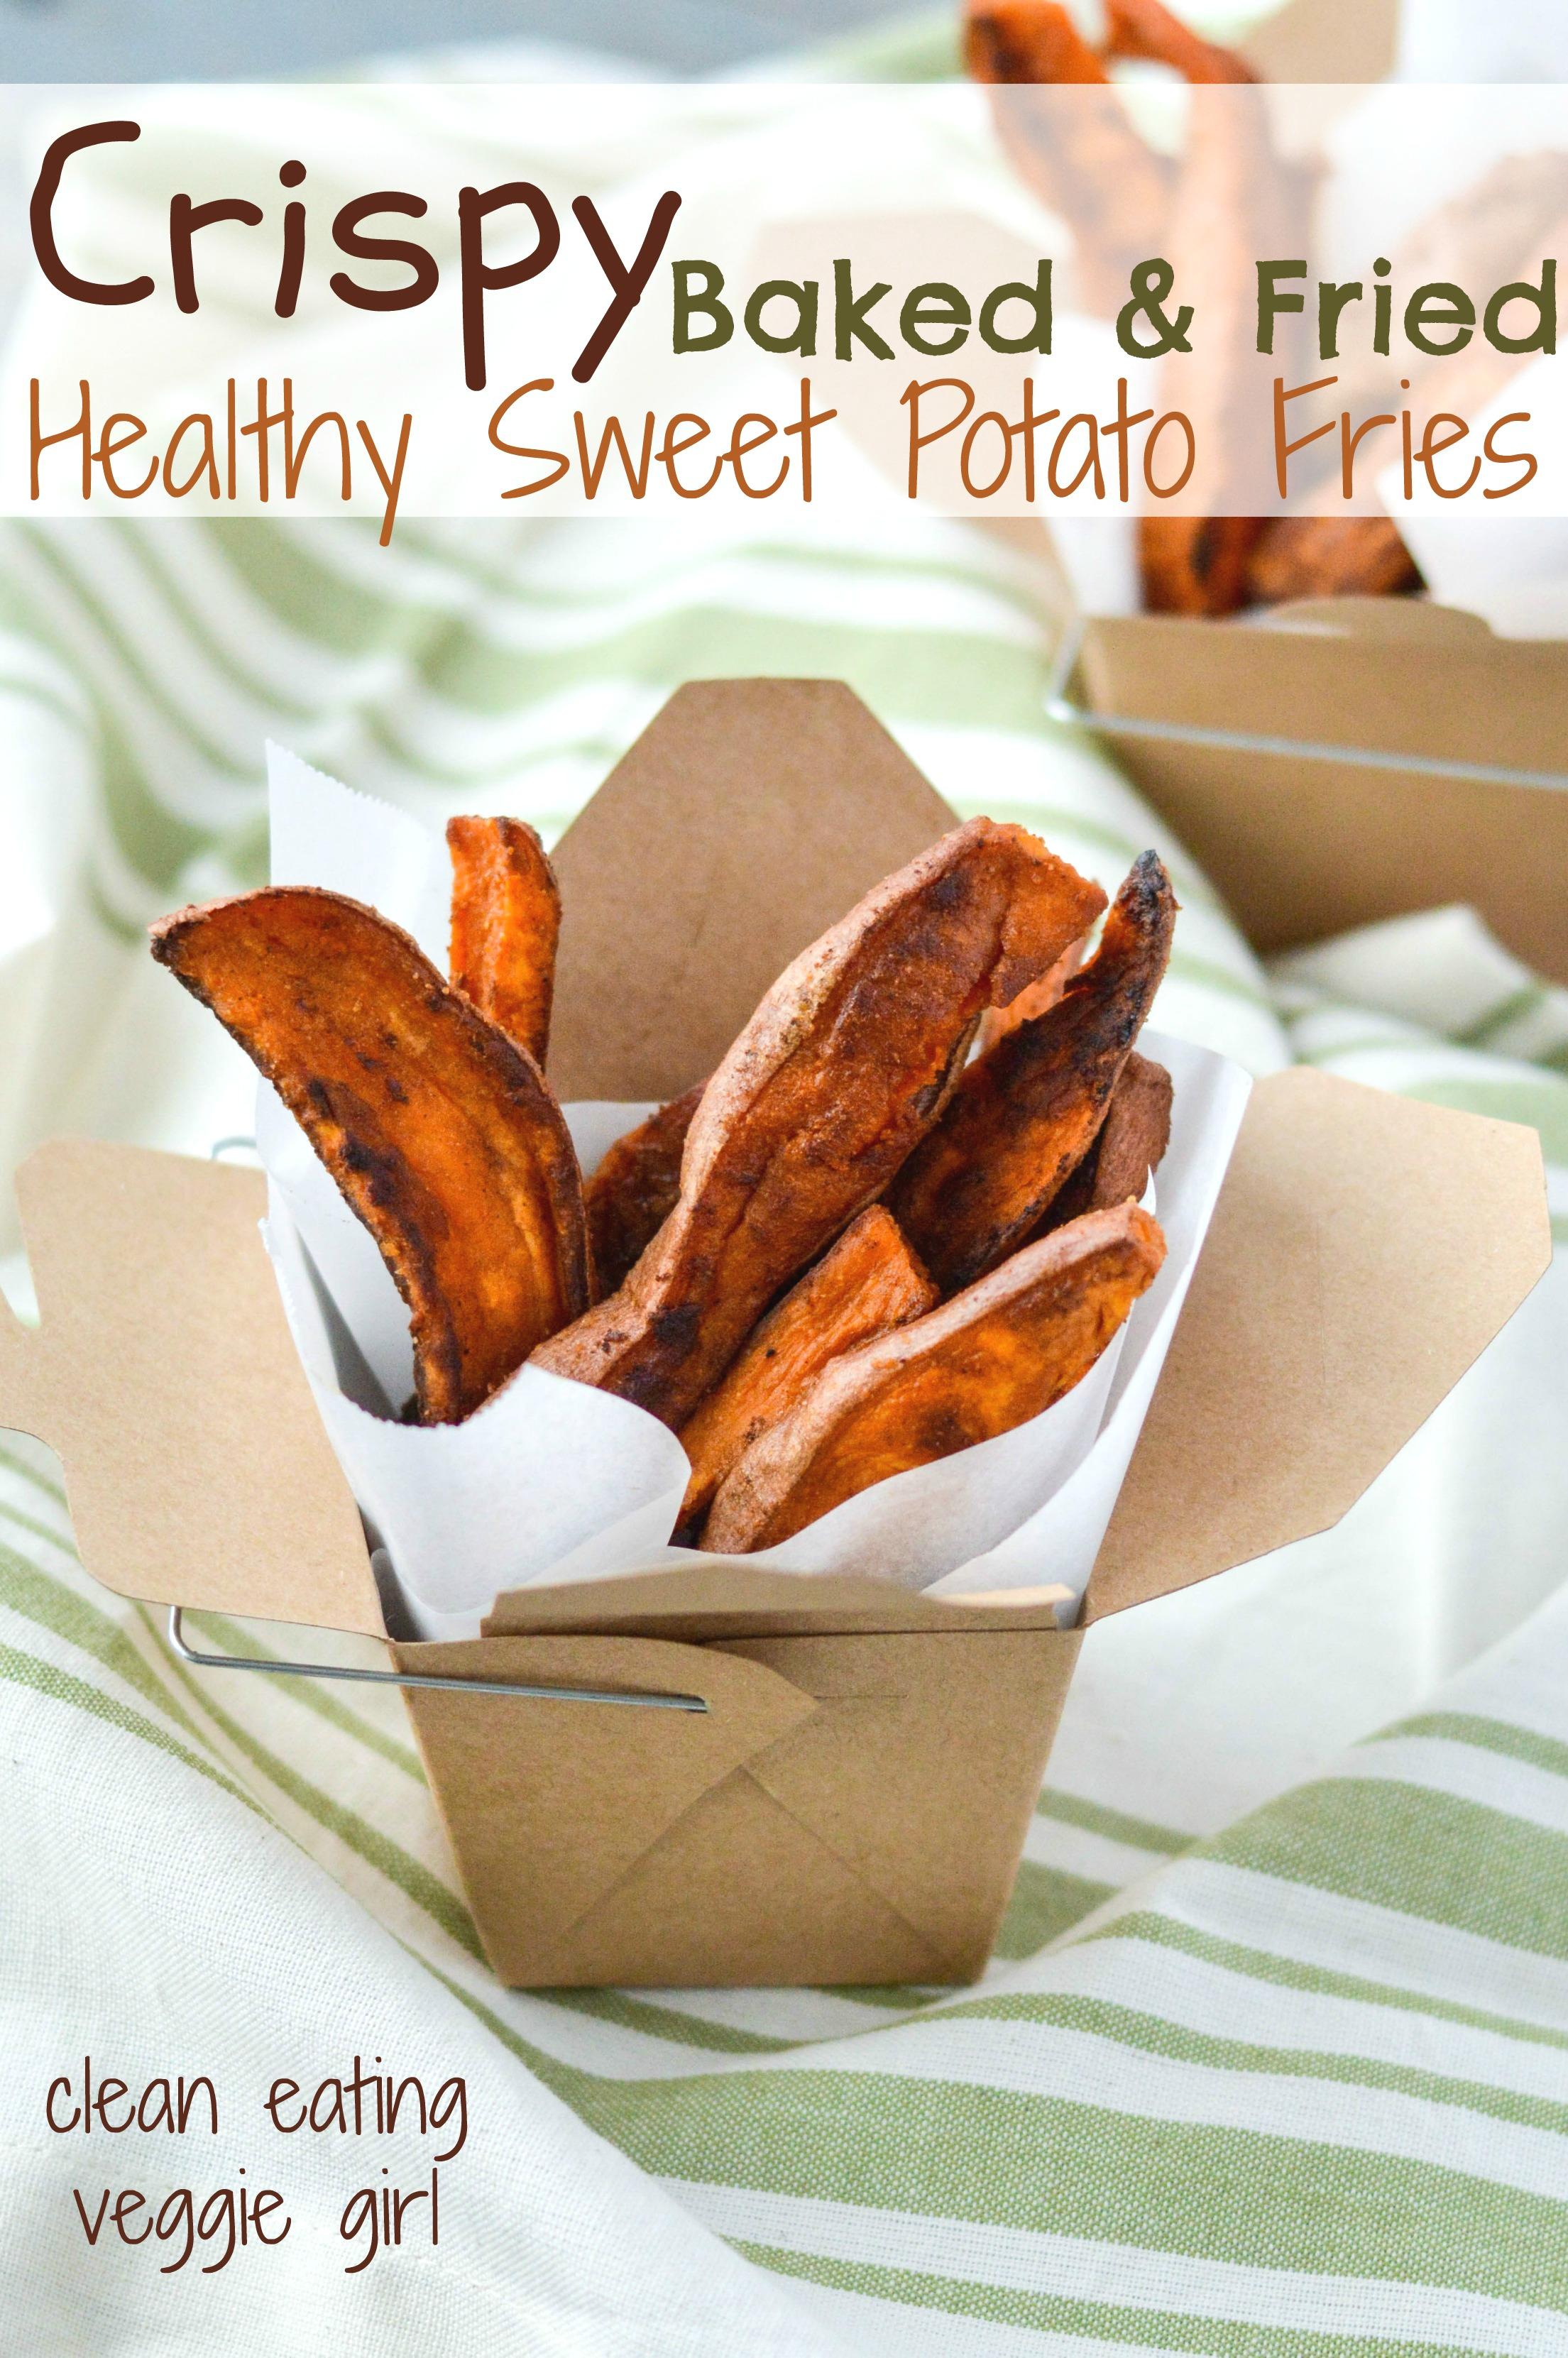 Crispy Baked Fried Healthy Sweet Potato Fries Aip Paleo Gluten Free